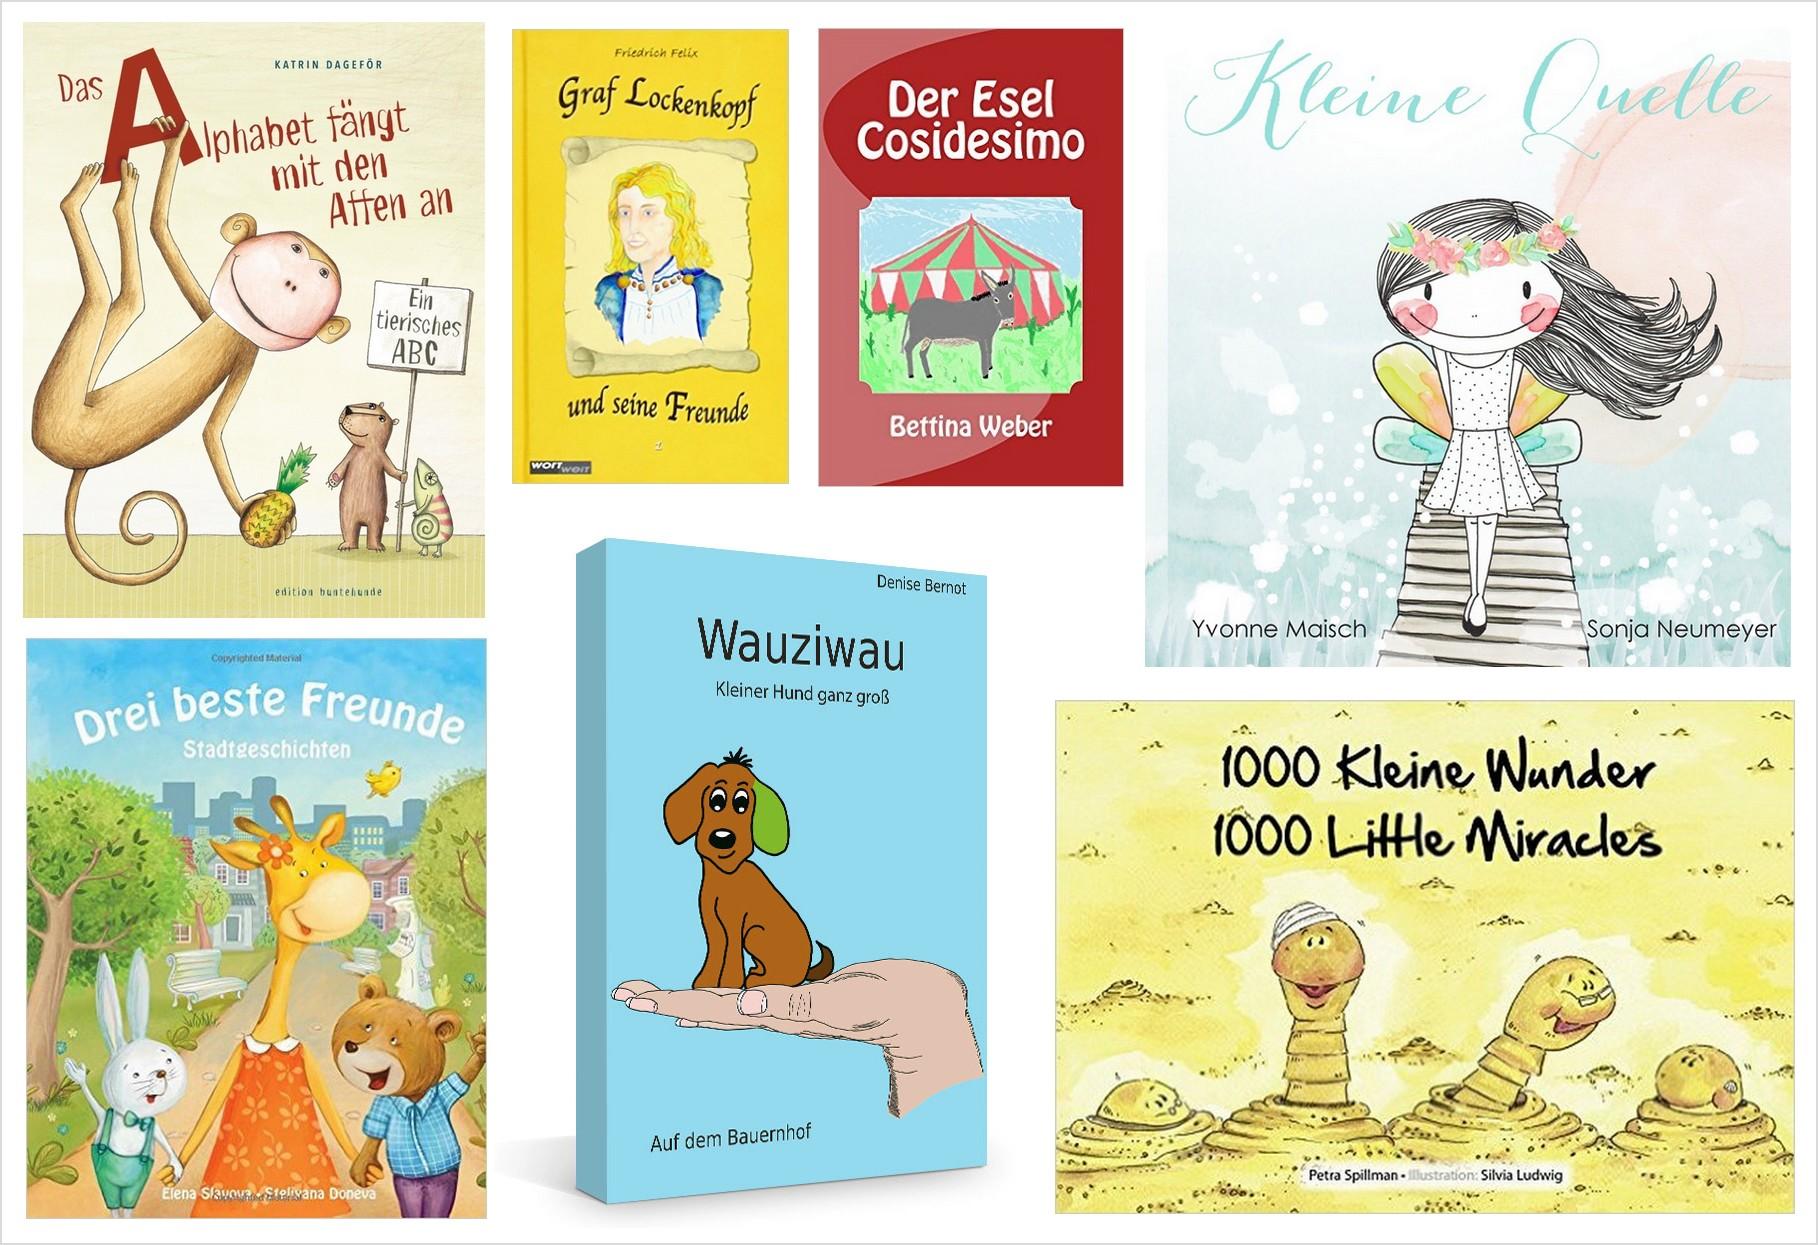 Kunterbunte Abenteuer: Kinderbuchperlen